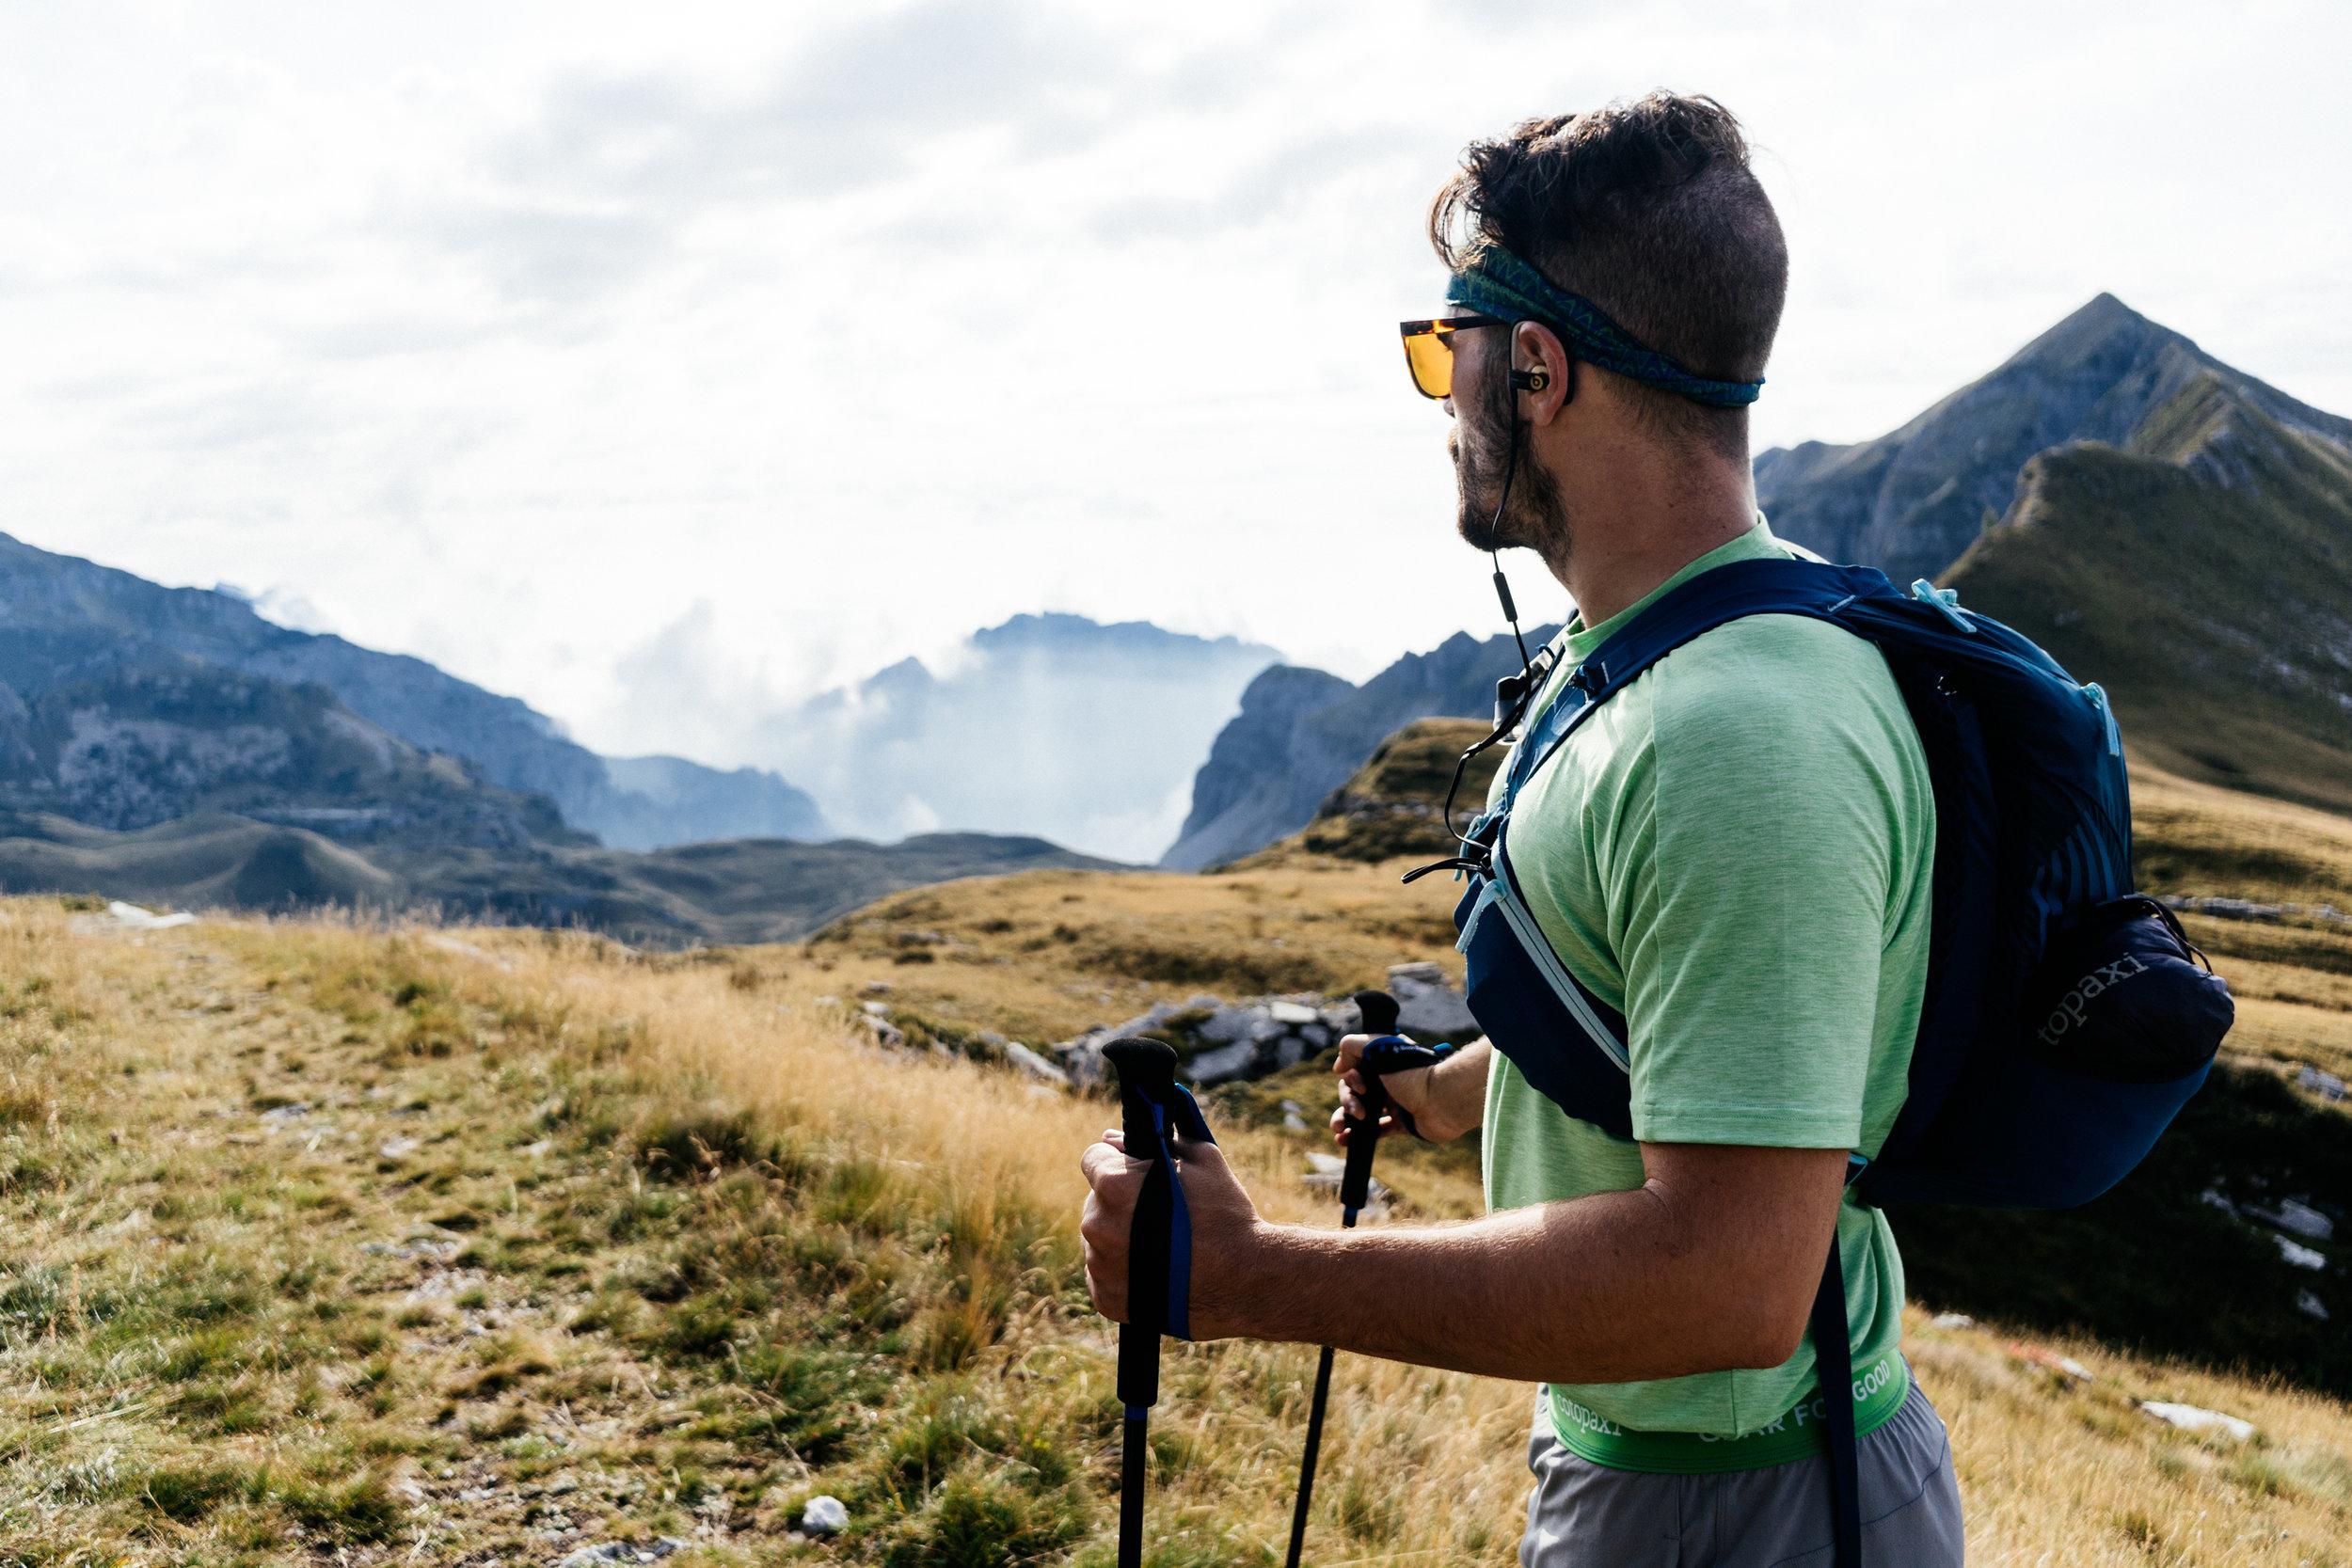 Dolomites-ChrisBrinleeJr-SEP17-7.jpg